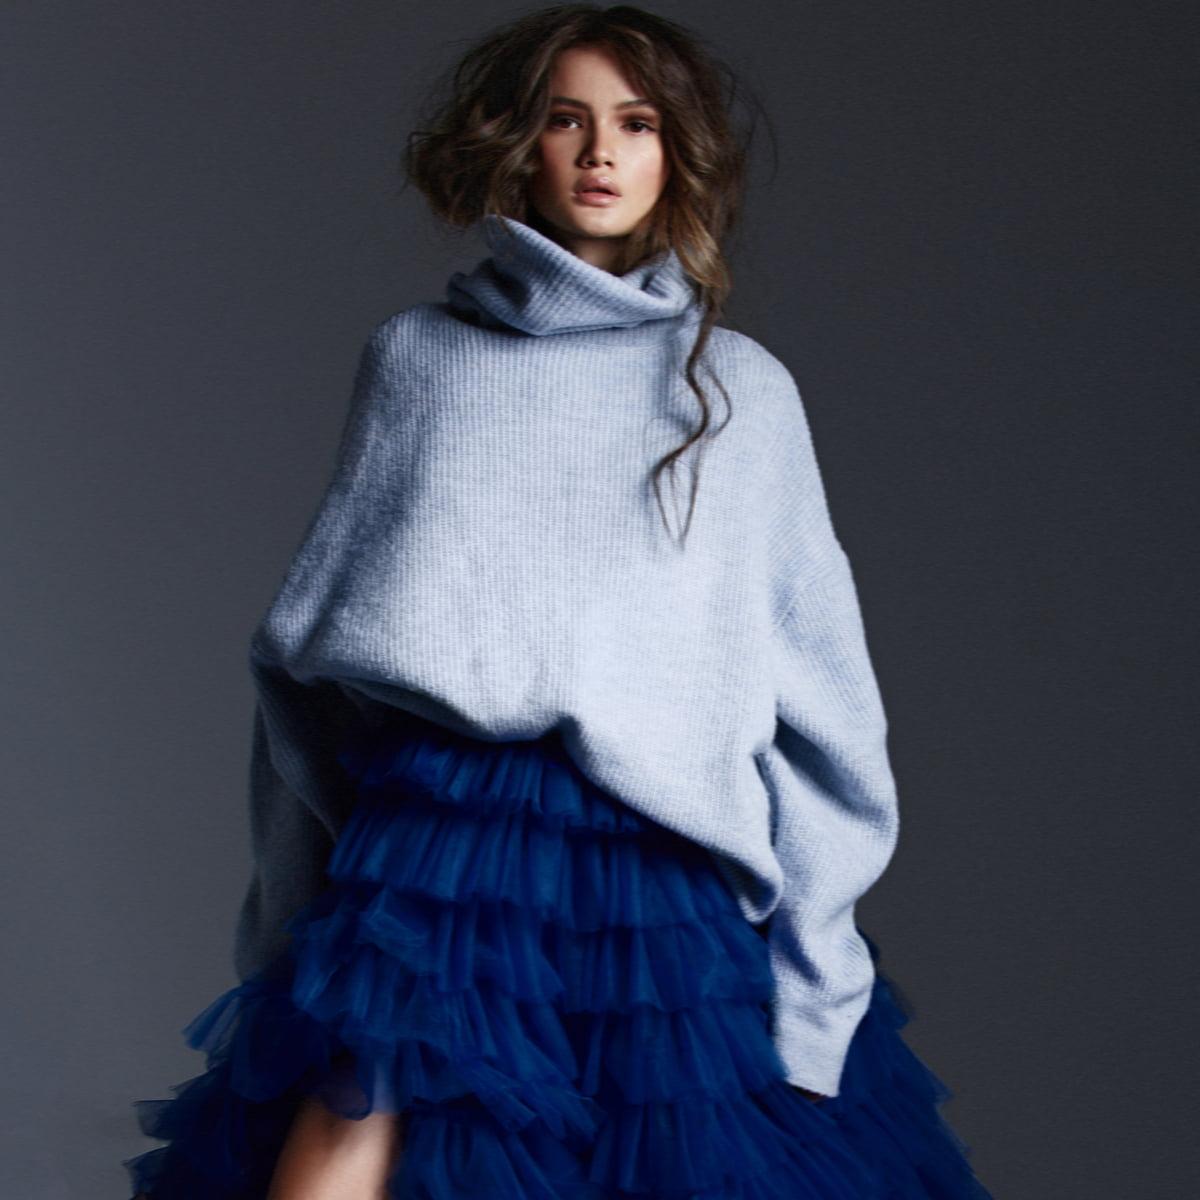 Photo by member @anastasia_whale.ph  #fashionphoto #editorialfashion #editorialphoto #sweaterstyle #stylephoto #modelshot #modellook #bluedress #beautyshot #fashionphotographer #editorialphotographer #cozystylepic.twitter.com/970oyzx0IE